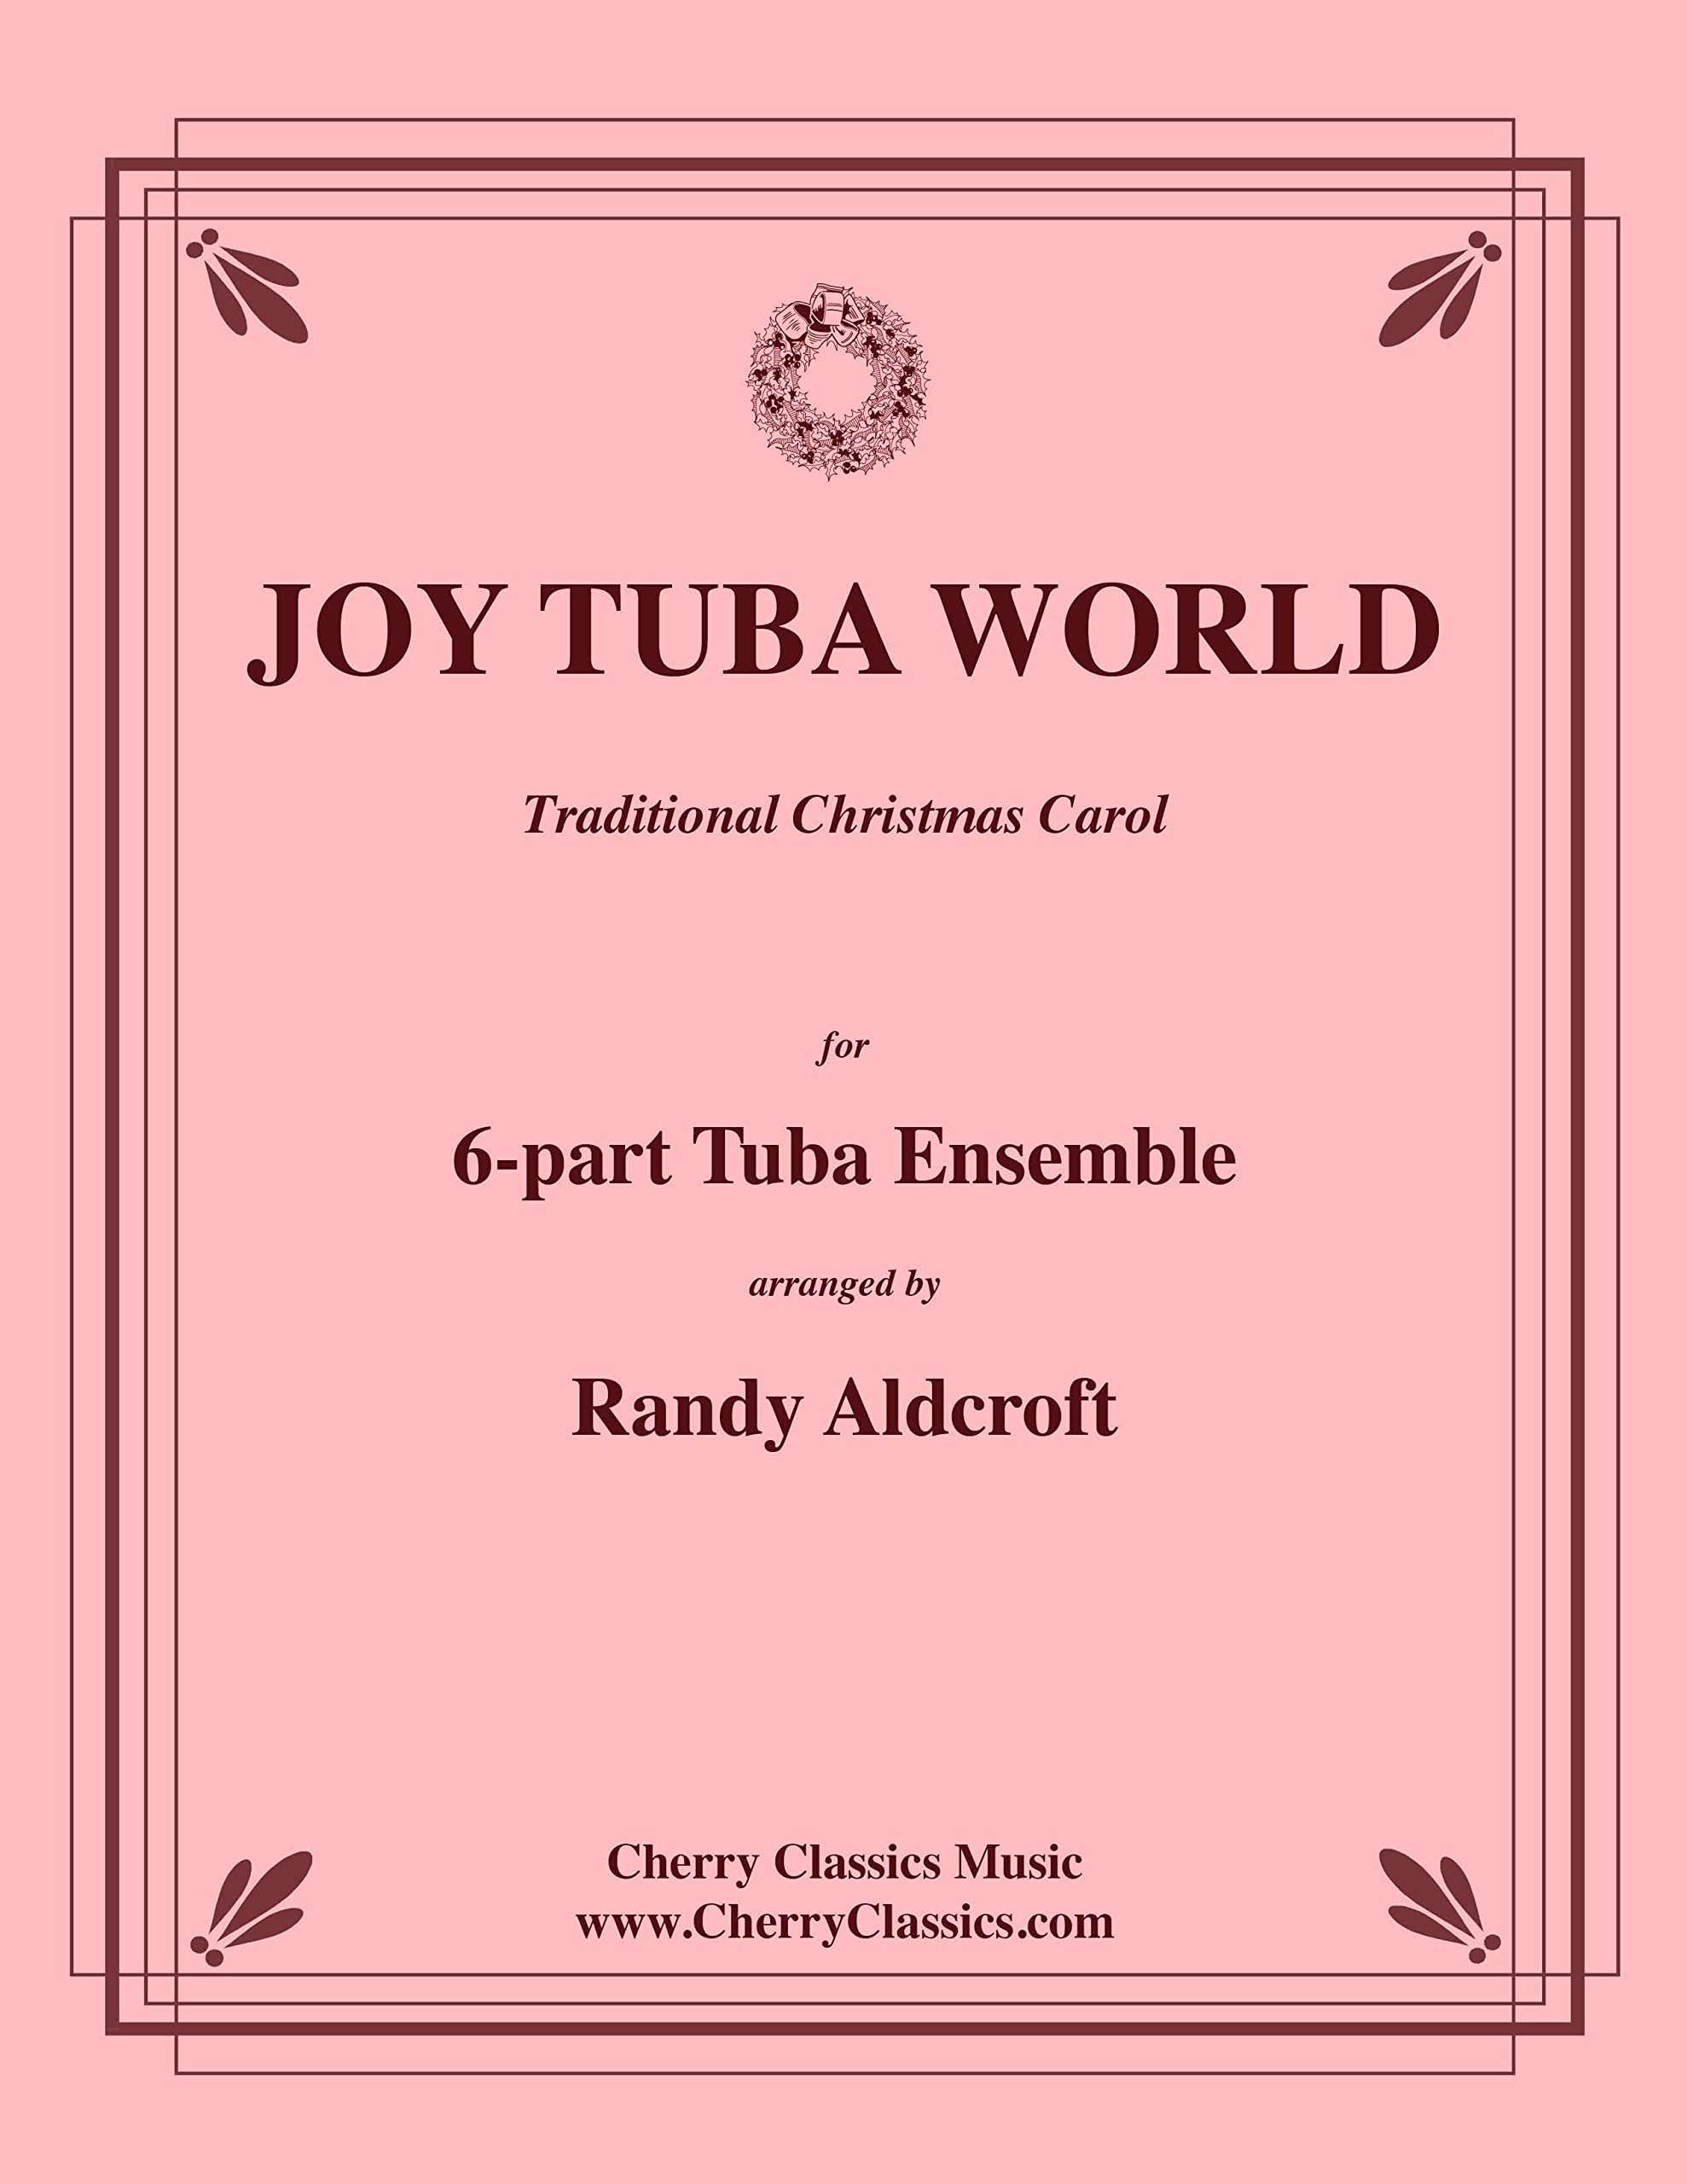 Joy Tuba World, Traditional Christmas Carol arranged by Randy Aldcroft for 6-part Tuba Ensemble Sextet